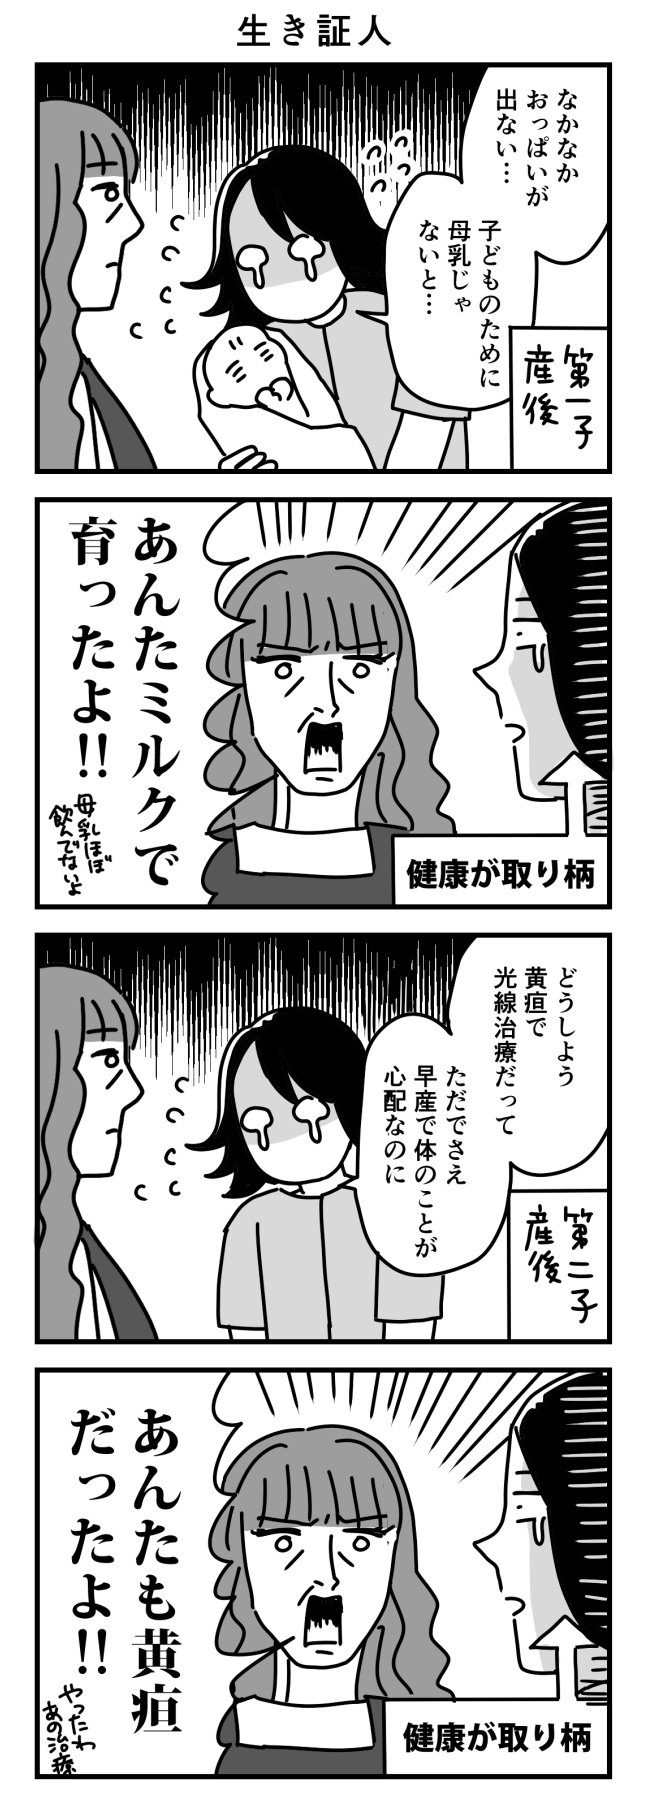 f:id:kanemotonomukuu:20201014113923j:plain